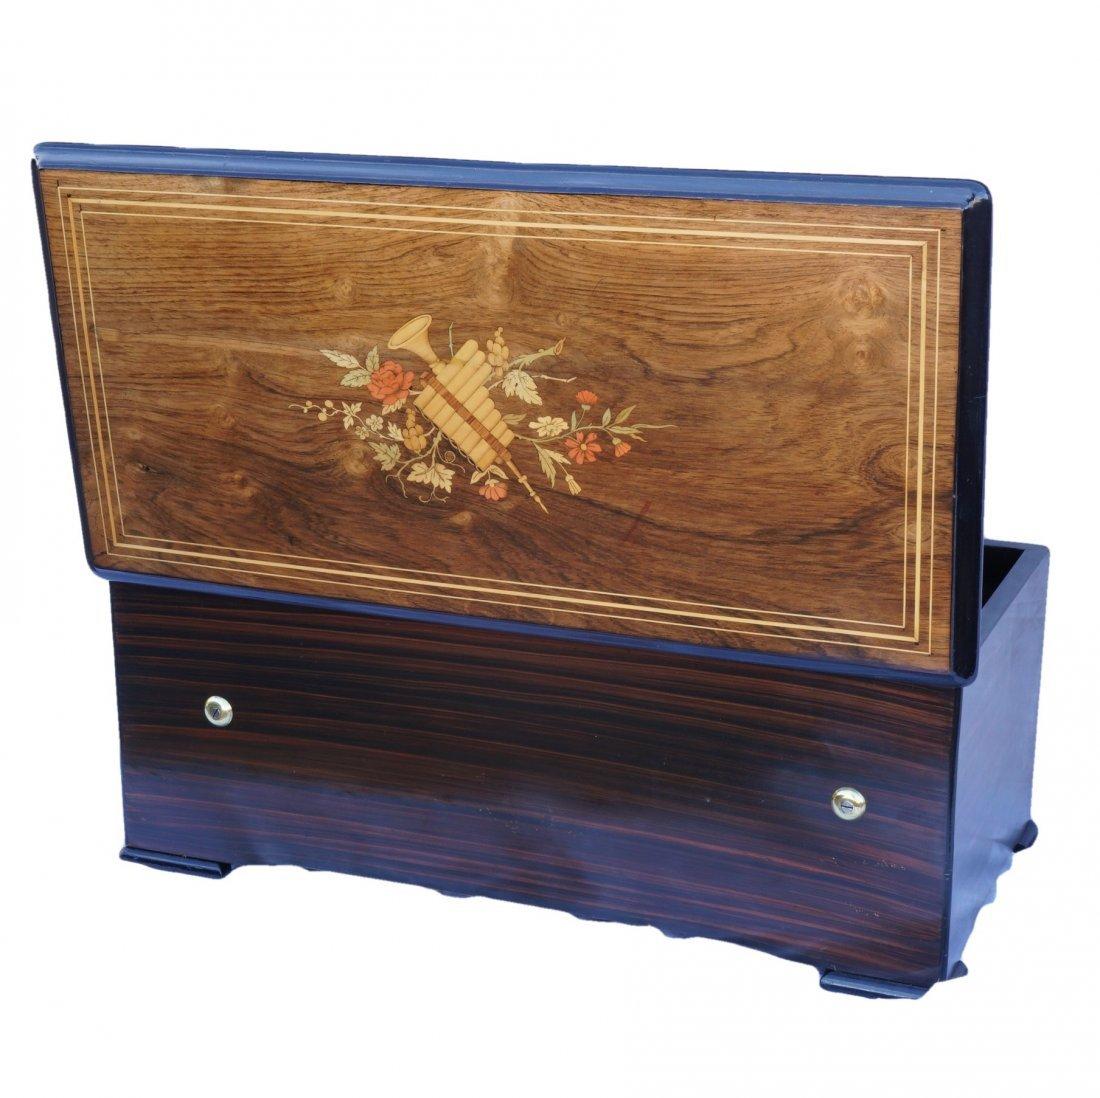 Paillard & Co. Inlaid Wood Cylinder Music Box